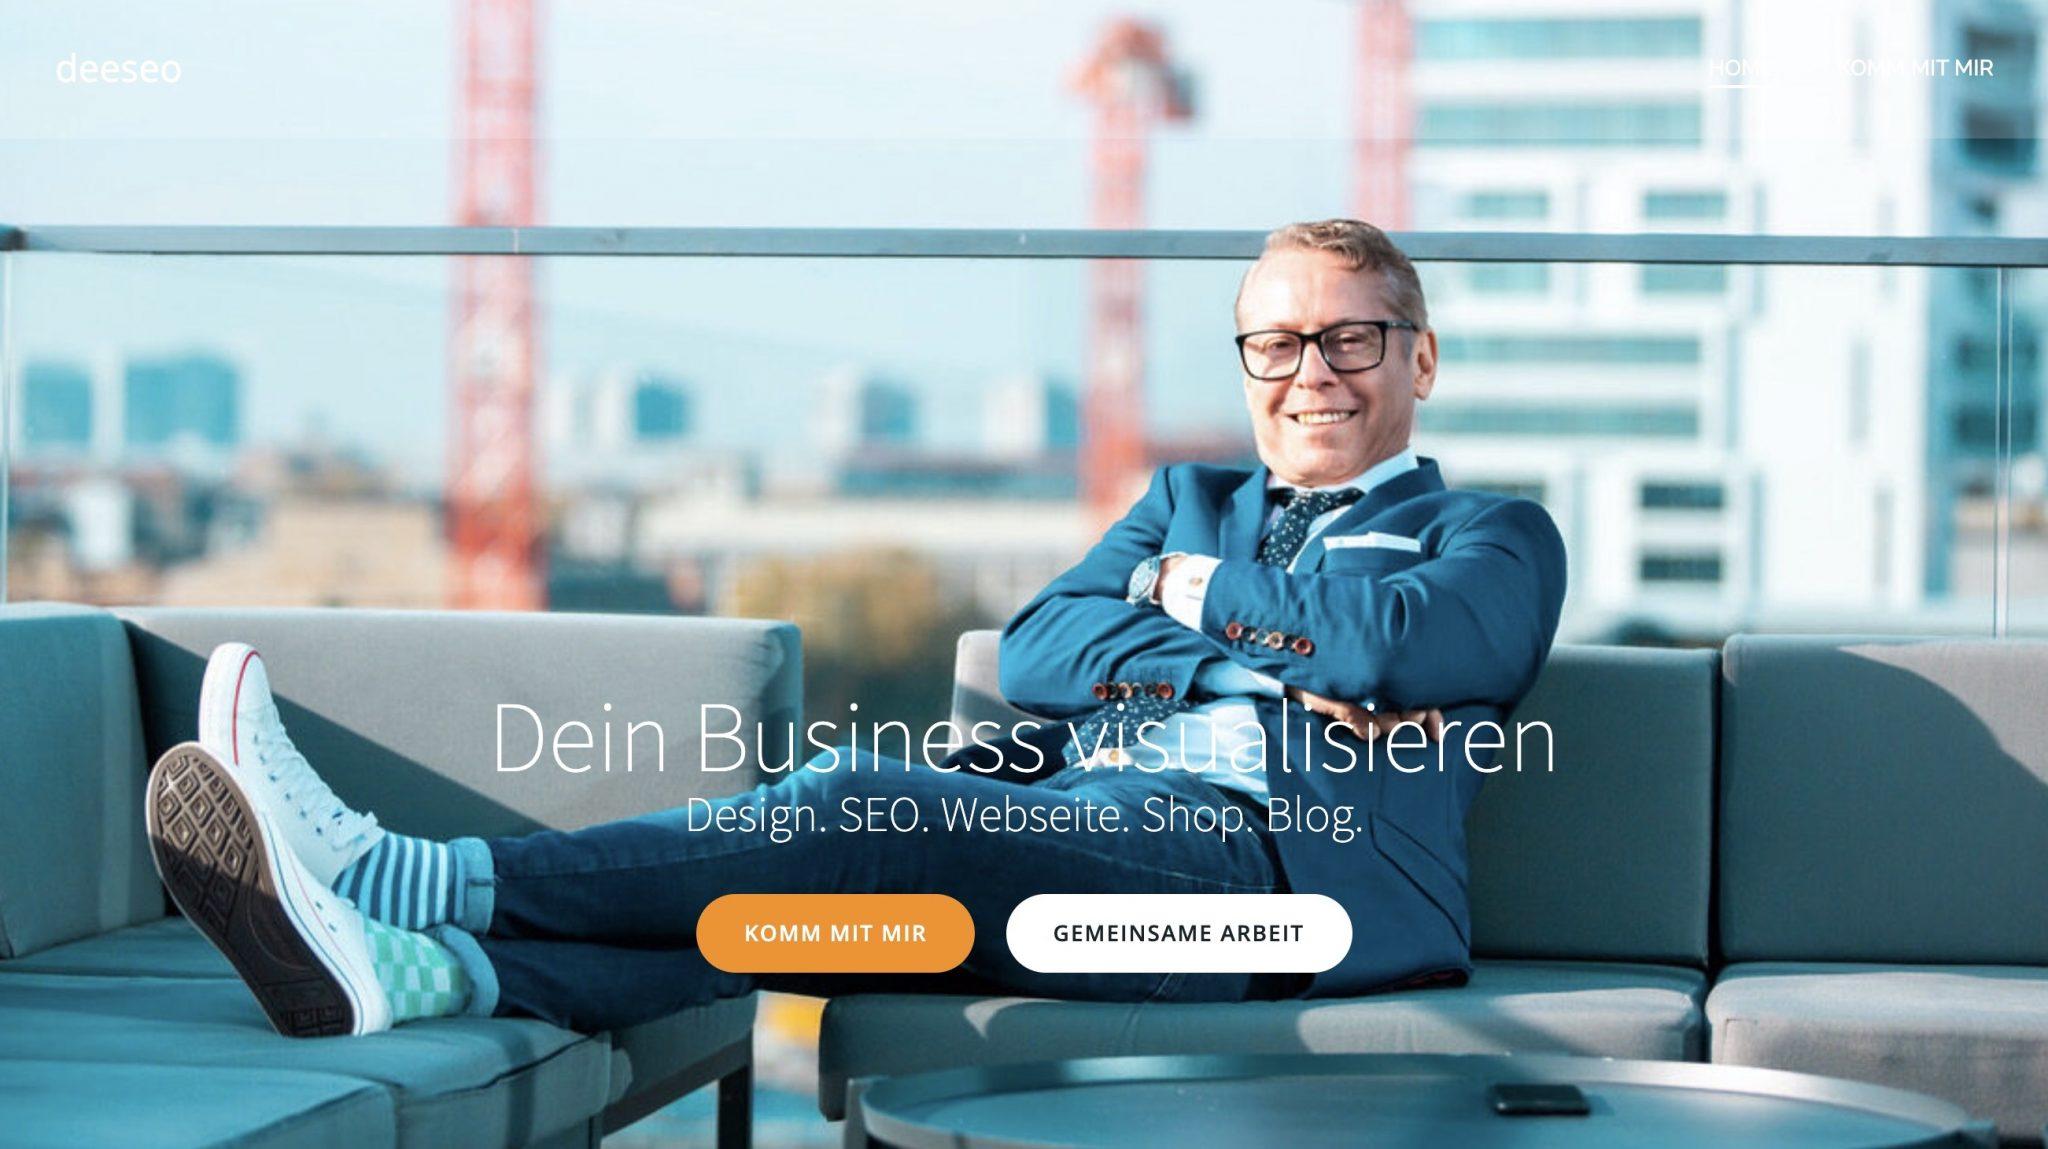 website design programming construction development design graphics photo concierge Gerry developer deeseo